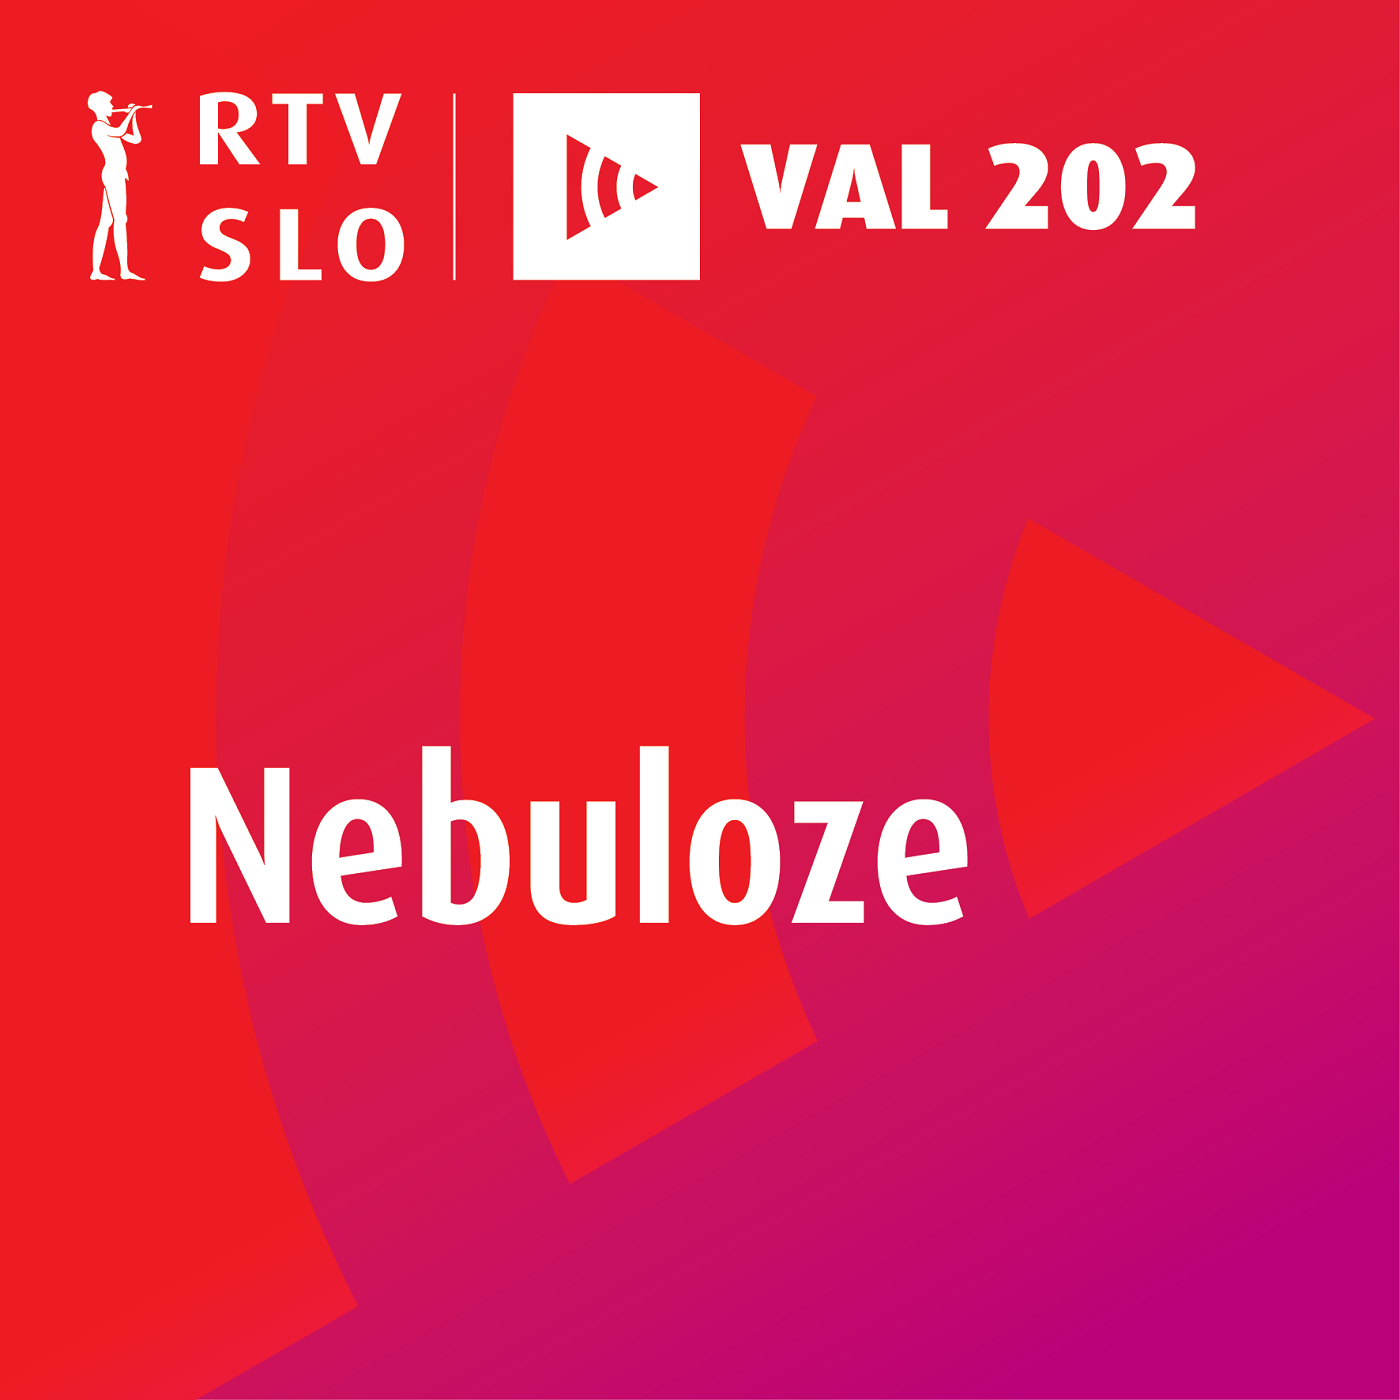 Nebuloze